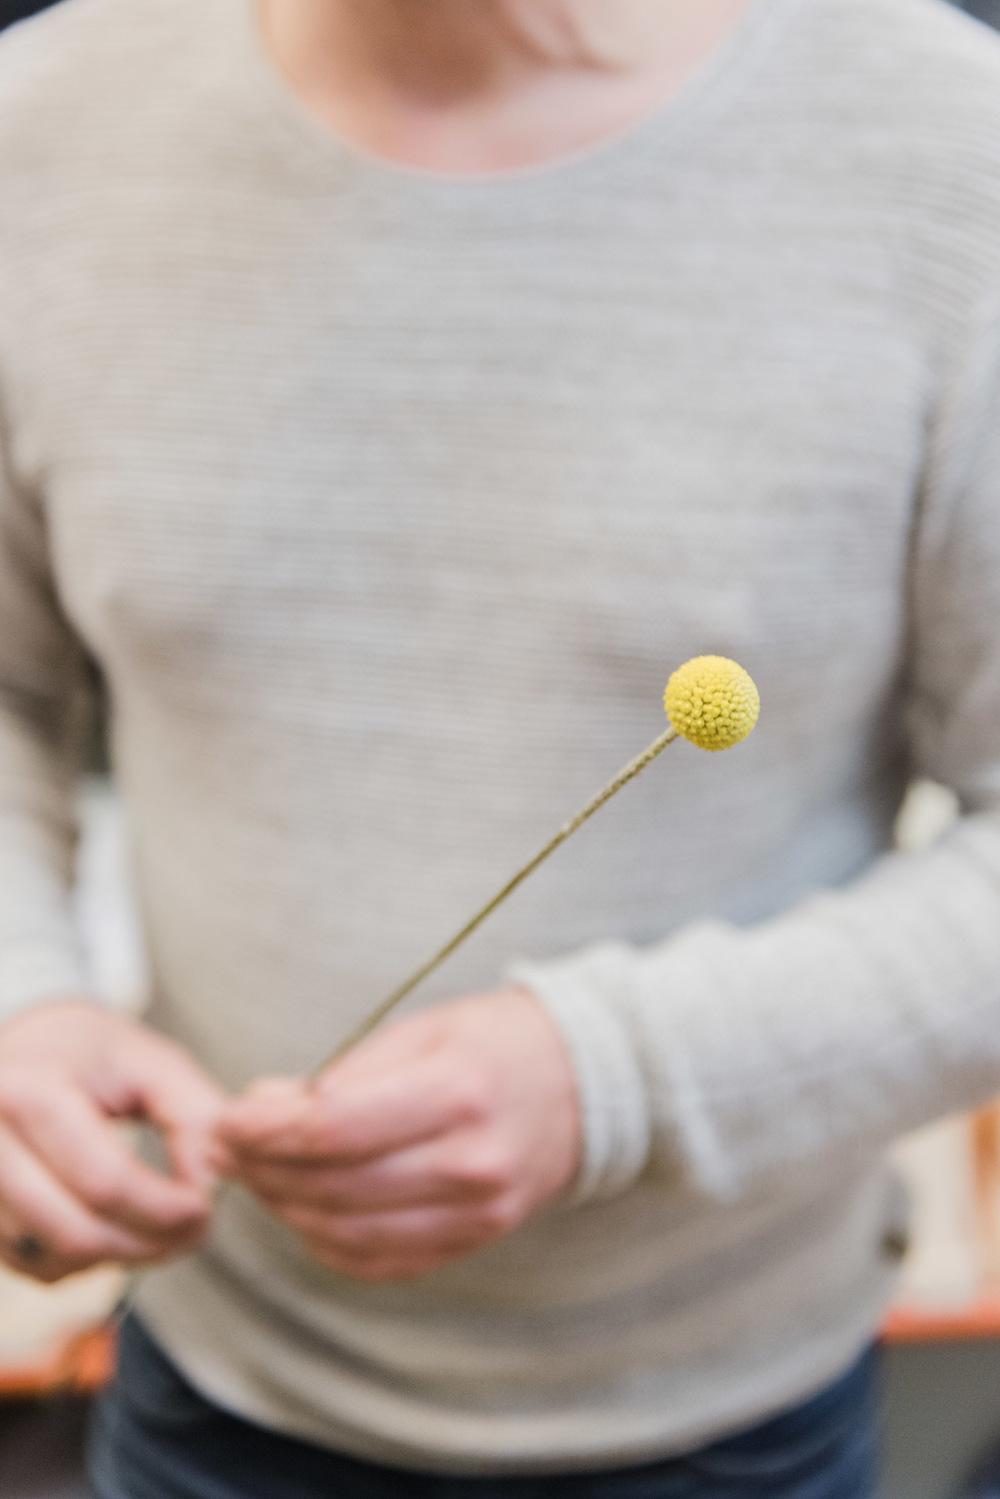 bloomon-passagen-wearecitykoeln-pramudiya-2.jpg